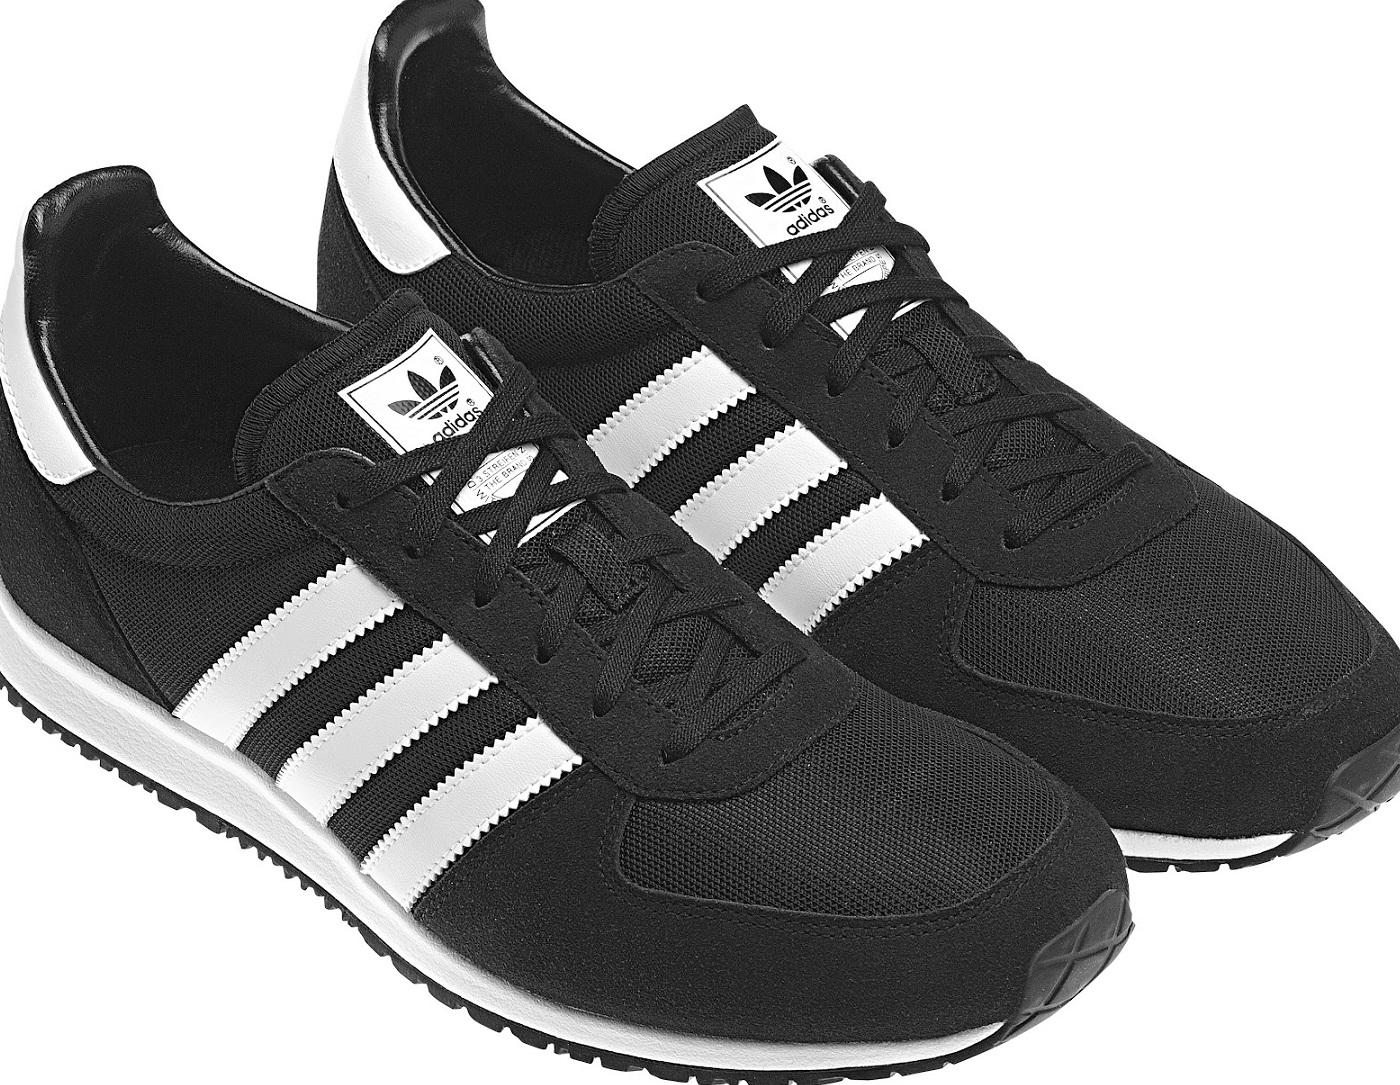 buy popular 7fd9a 36ee6 Adidas Spor Ayakkabı Modelleri